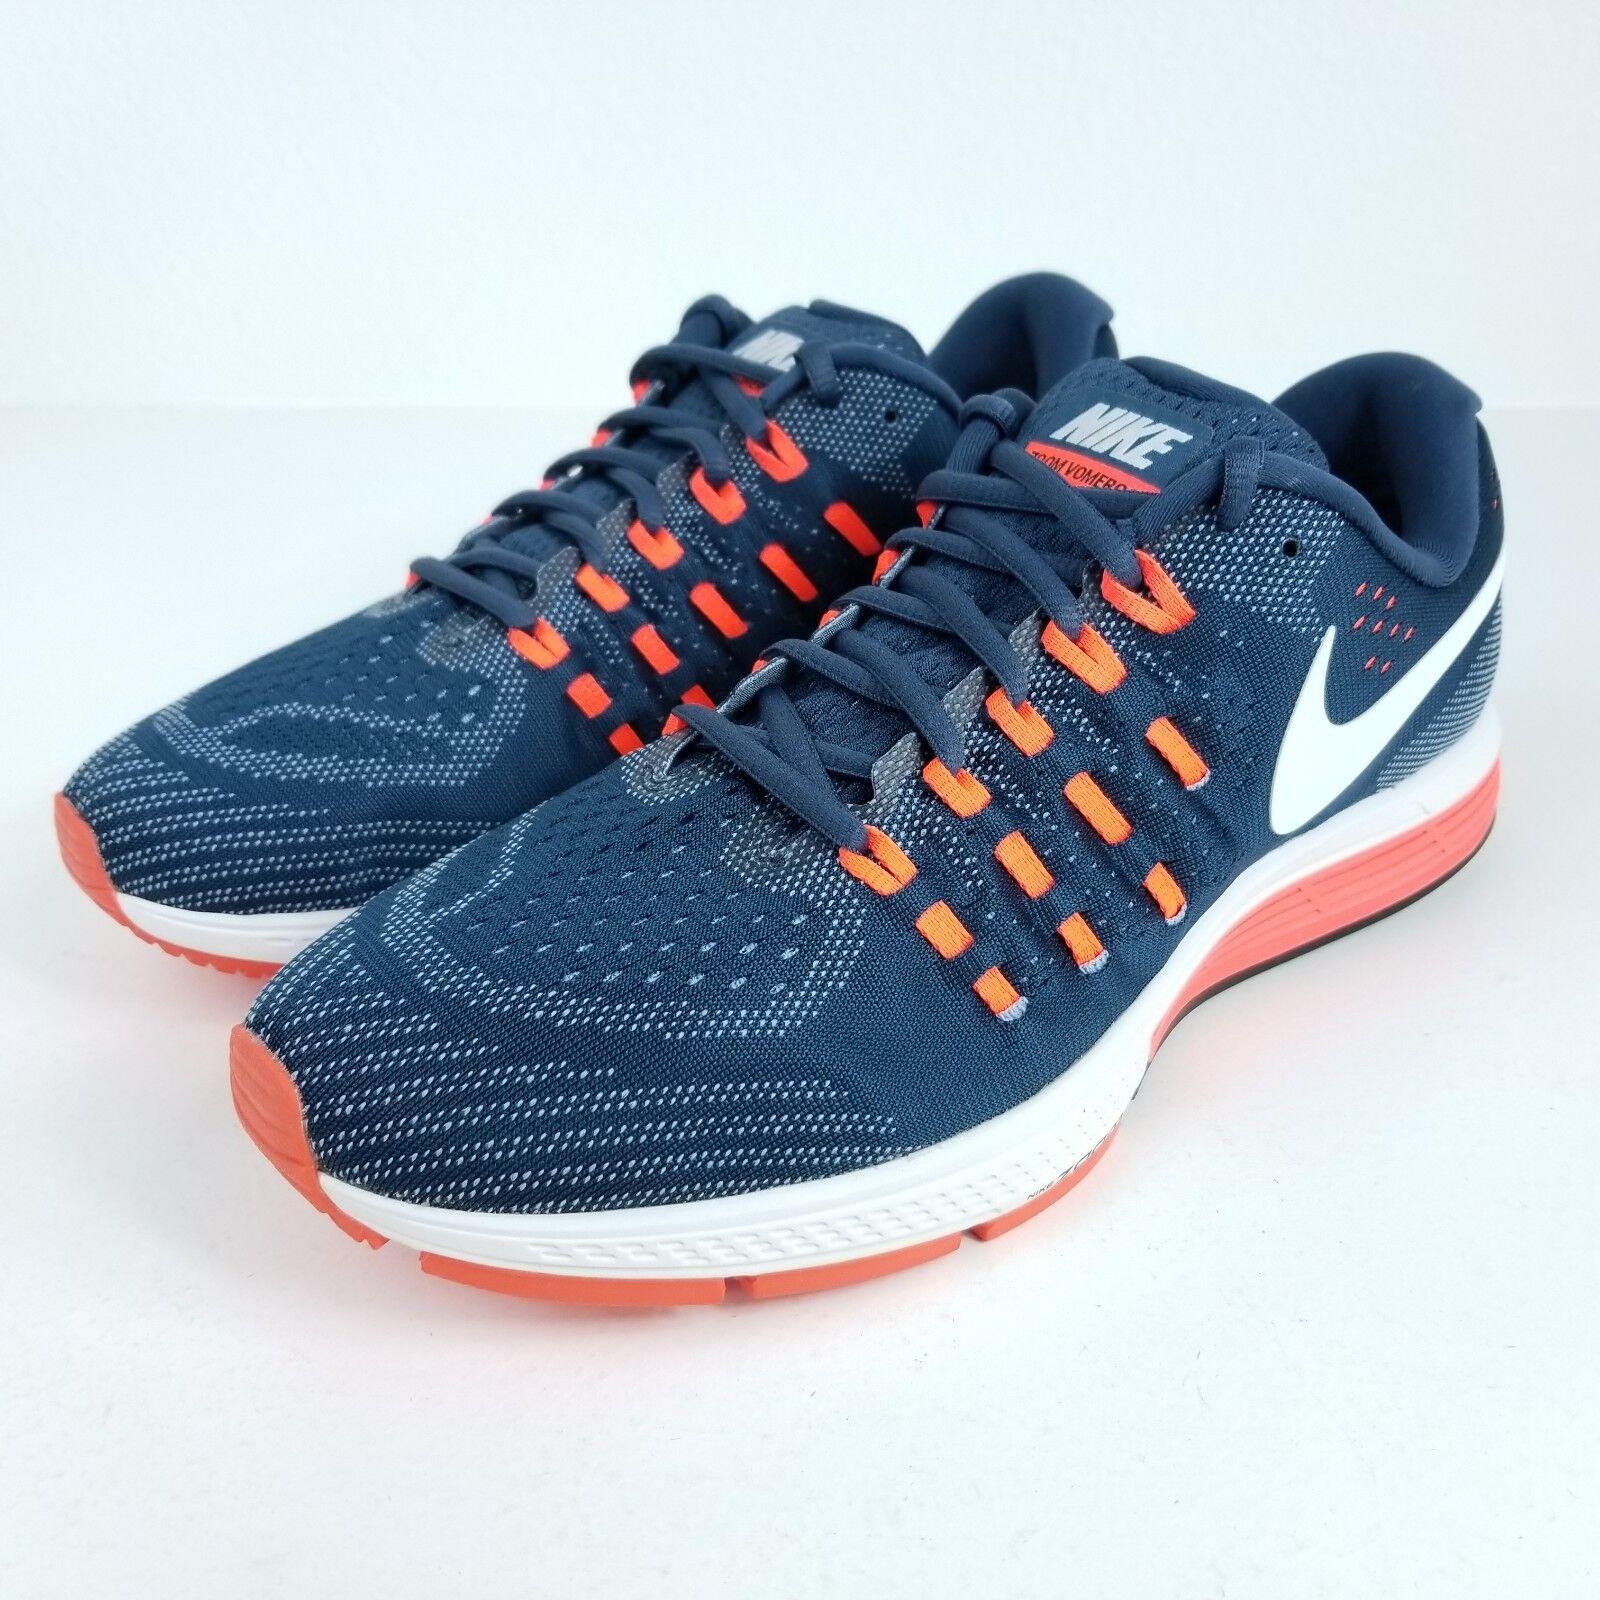 Nike blu air zoom vomero 11 uomini sz molteplici scarpe blu Nike arancione bianco 818099 401 65d76e